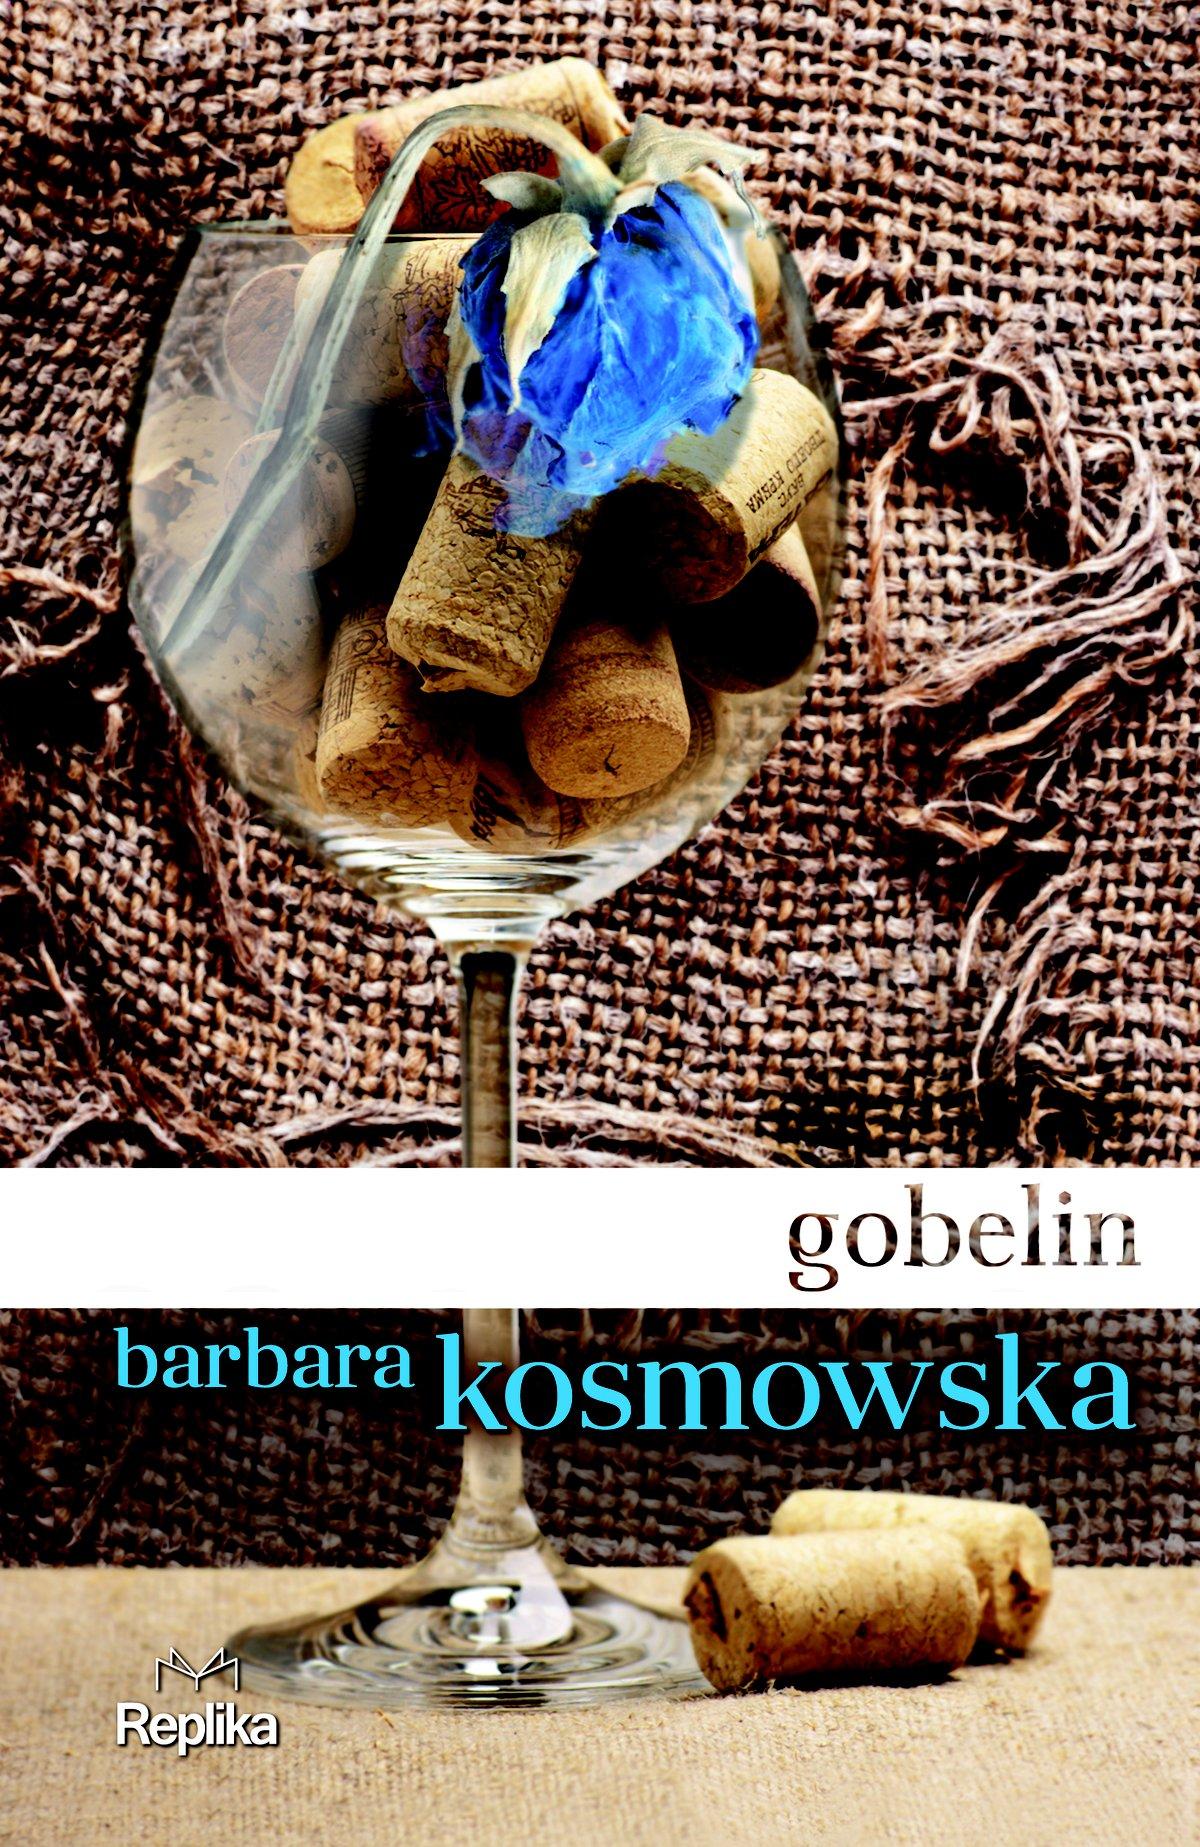 Gobelin - Ebook (Książka na Kindle) do pobrania w formacie MOBI